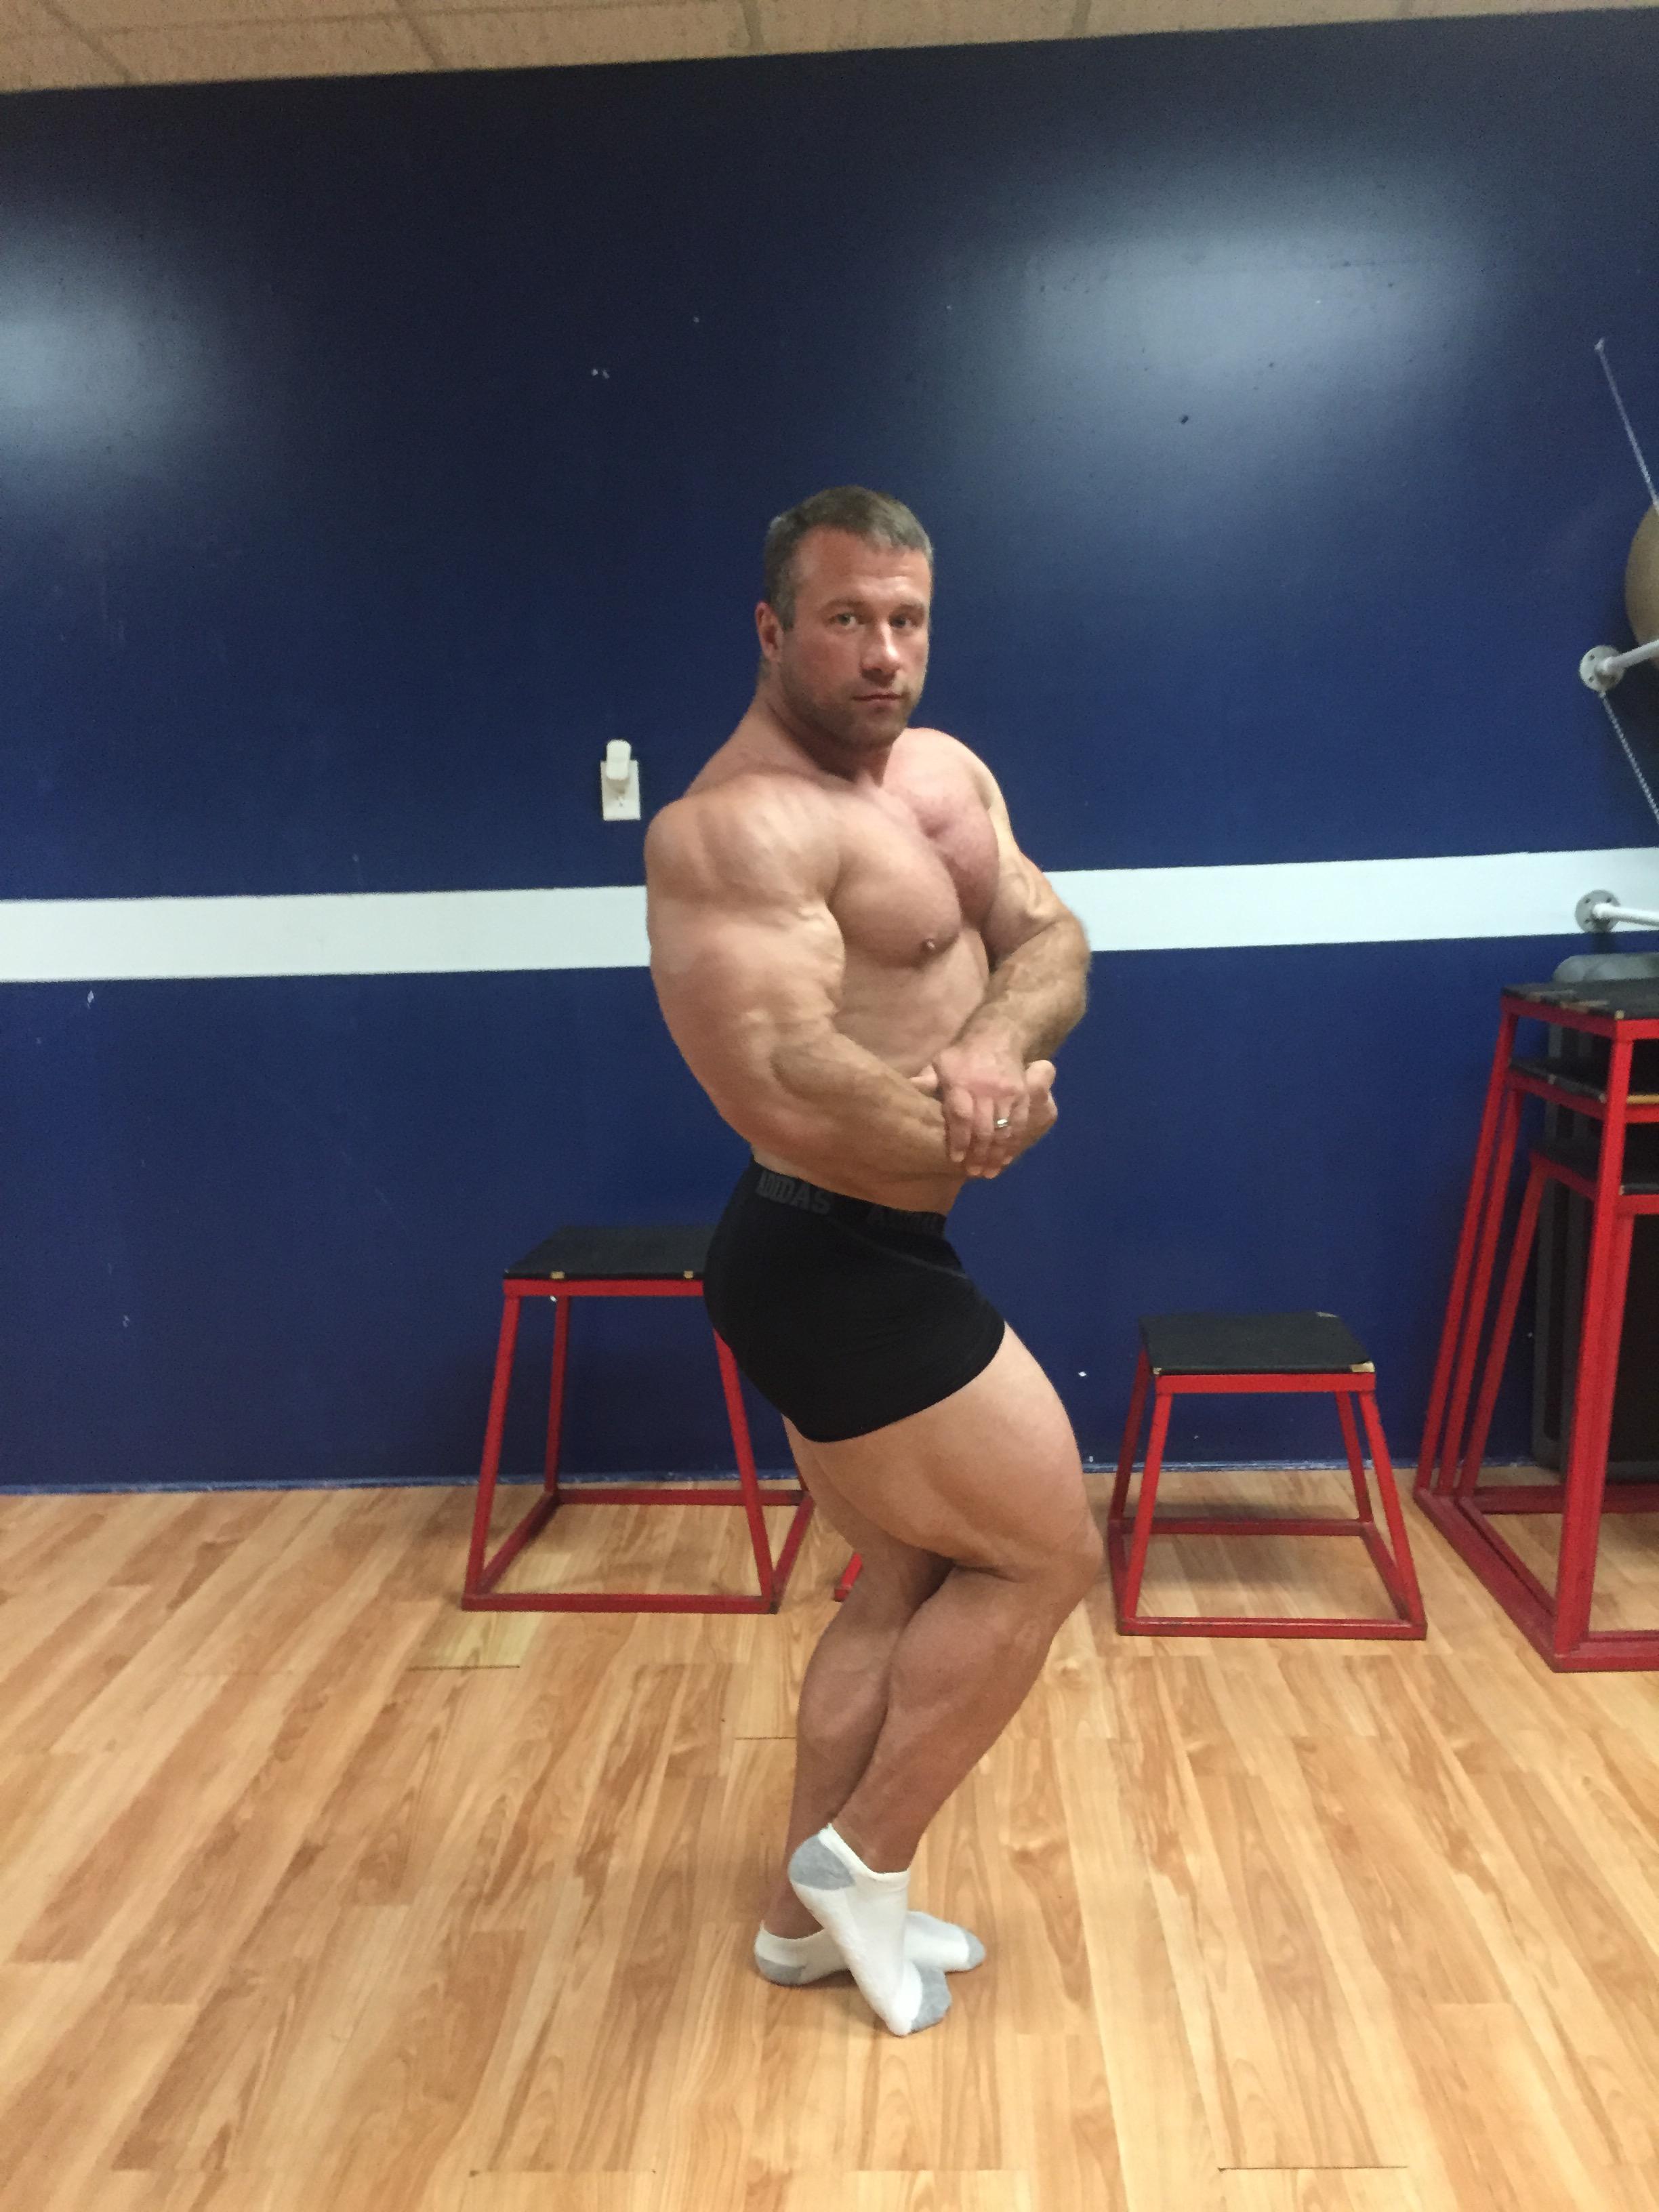 Legs - 7 weeks out